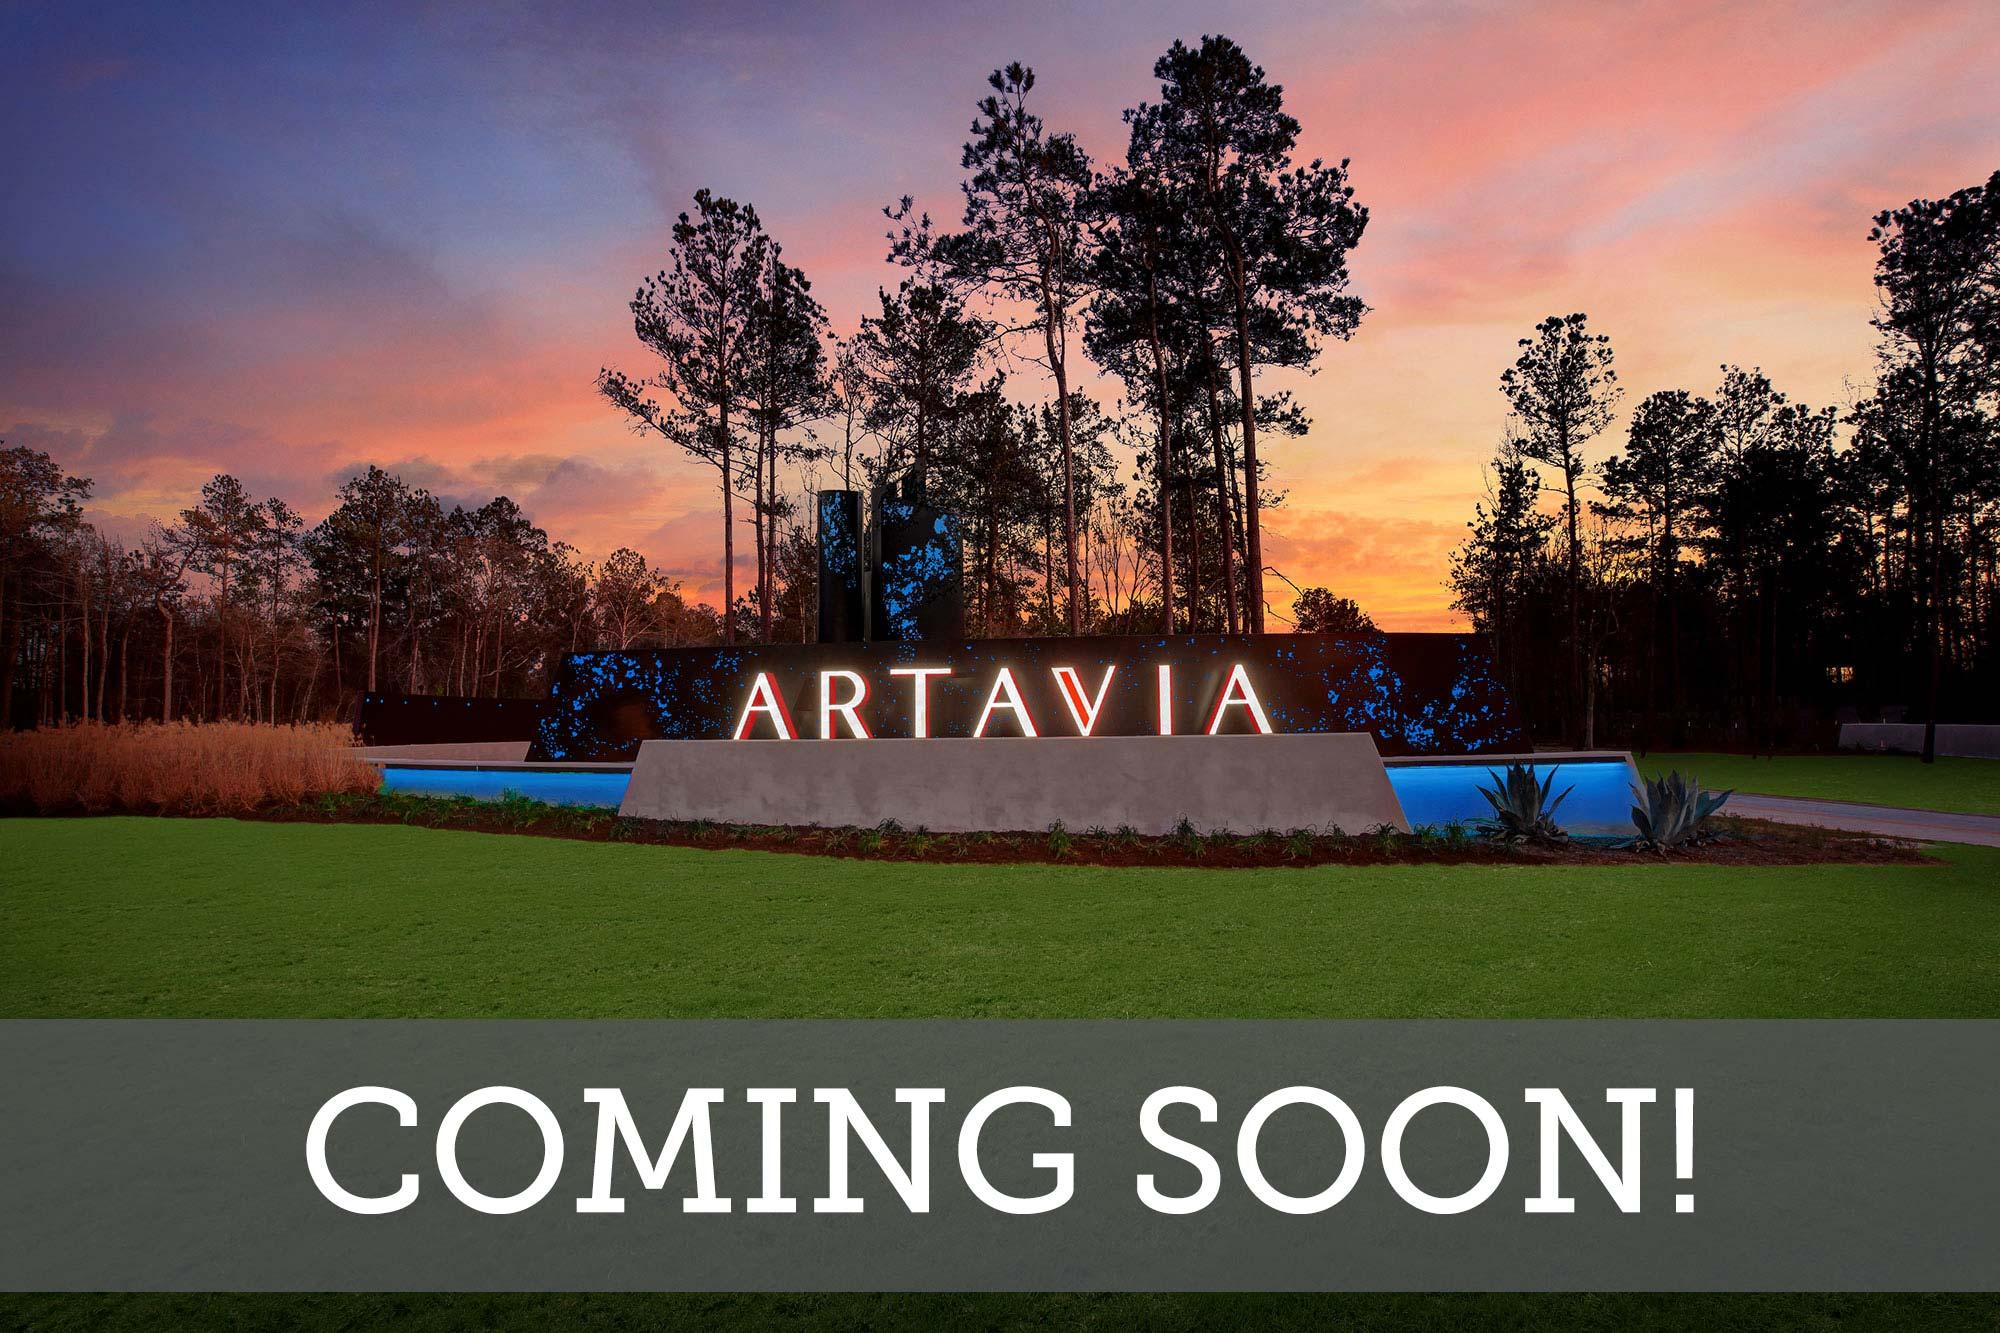 ARTAVIA - Coming Soon